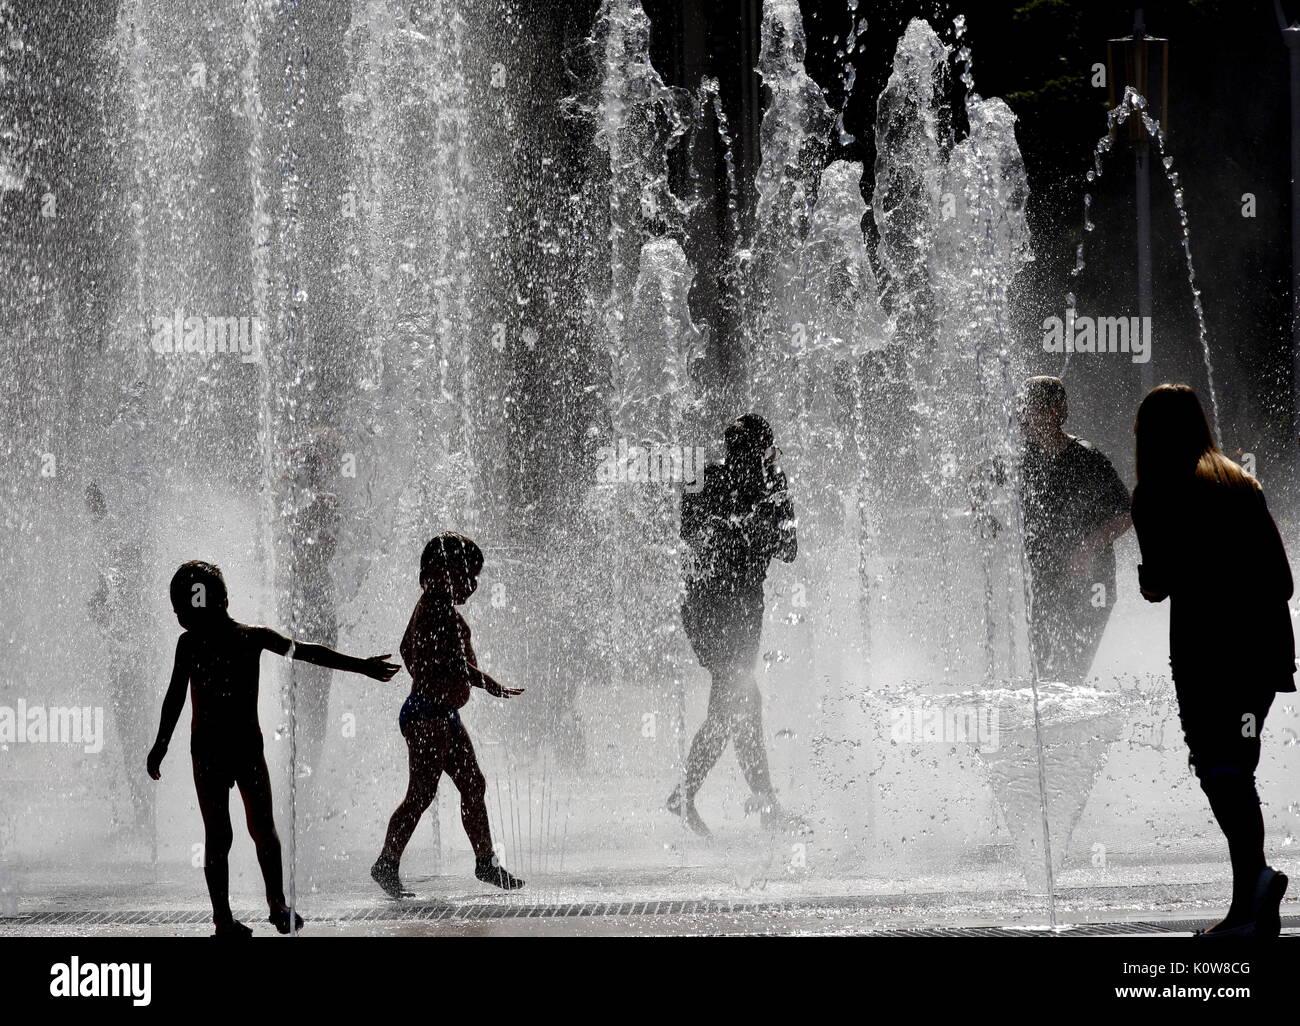 YAROSLAVL, RUSSIA - AUGUST 7, 2017: Children play in a fountain. Valery Matytsin/TASS - Stock Image